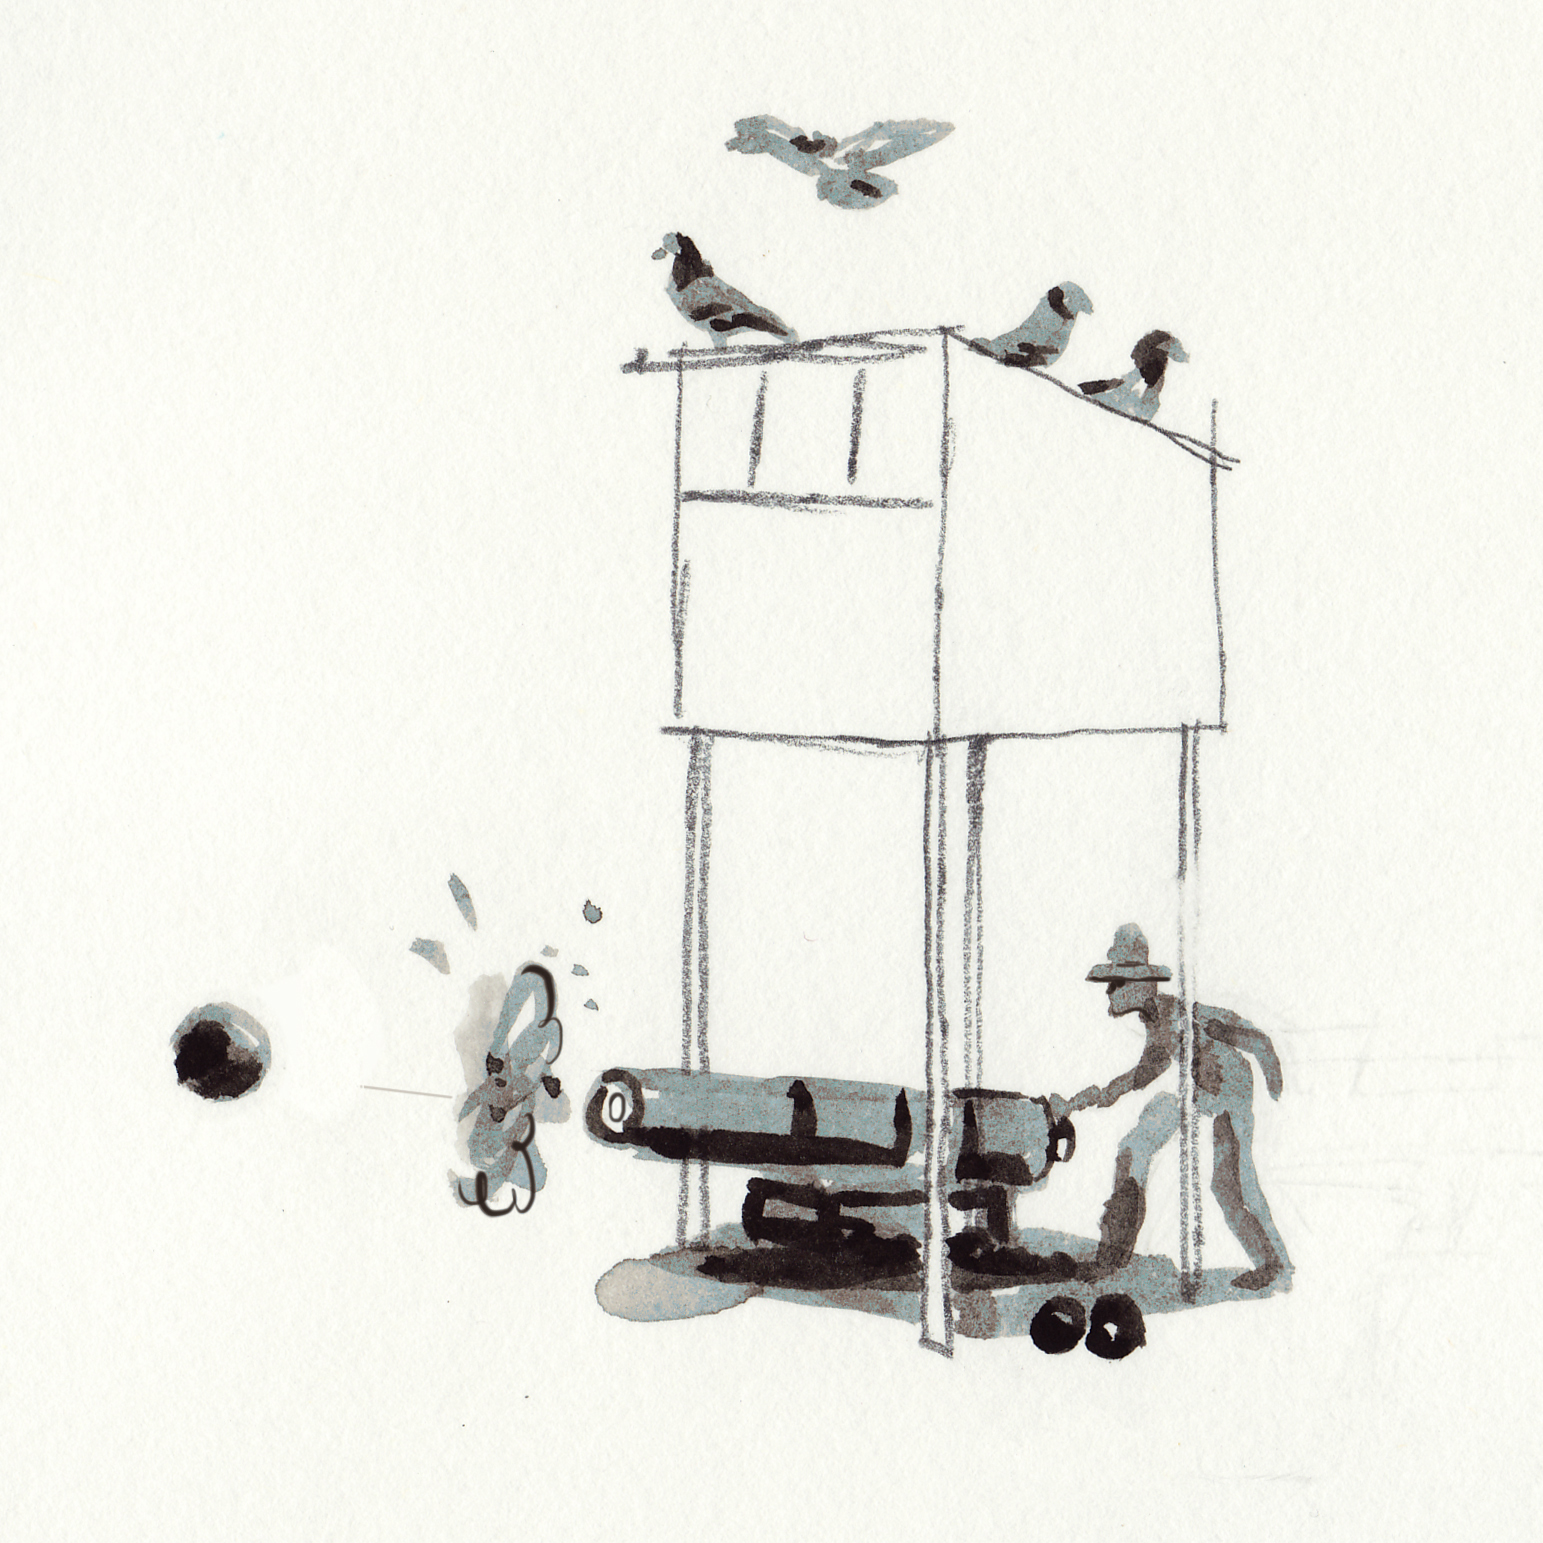 duiven schieten.jpg